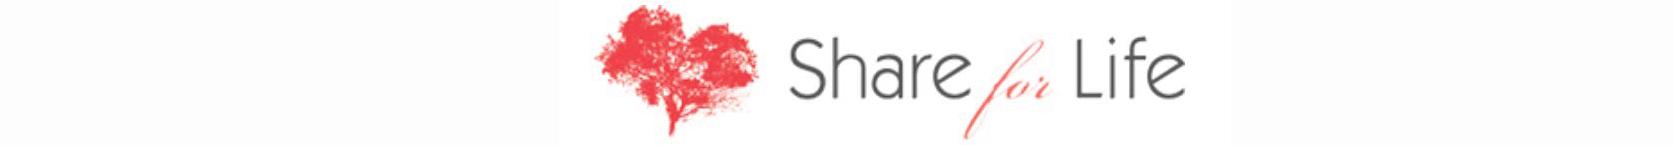 Share 4 Life